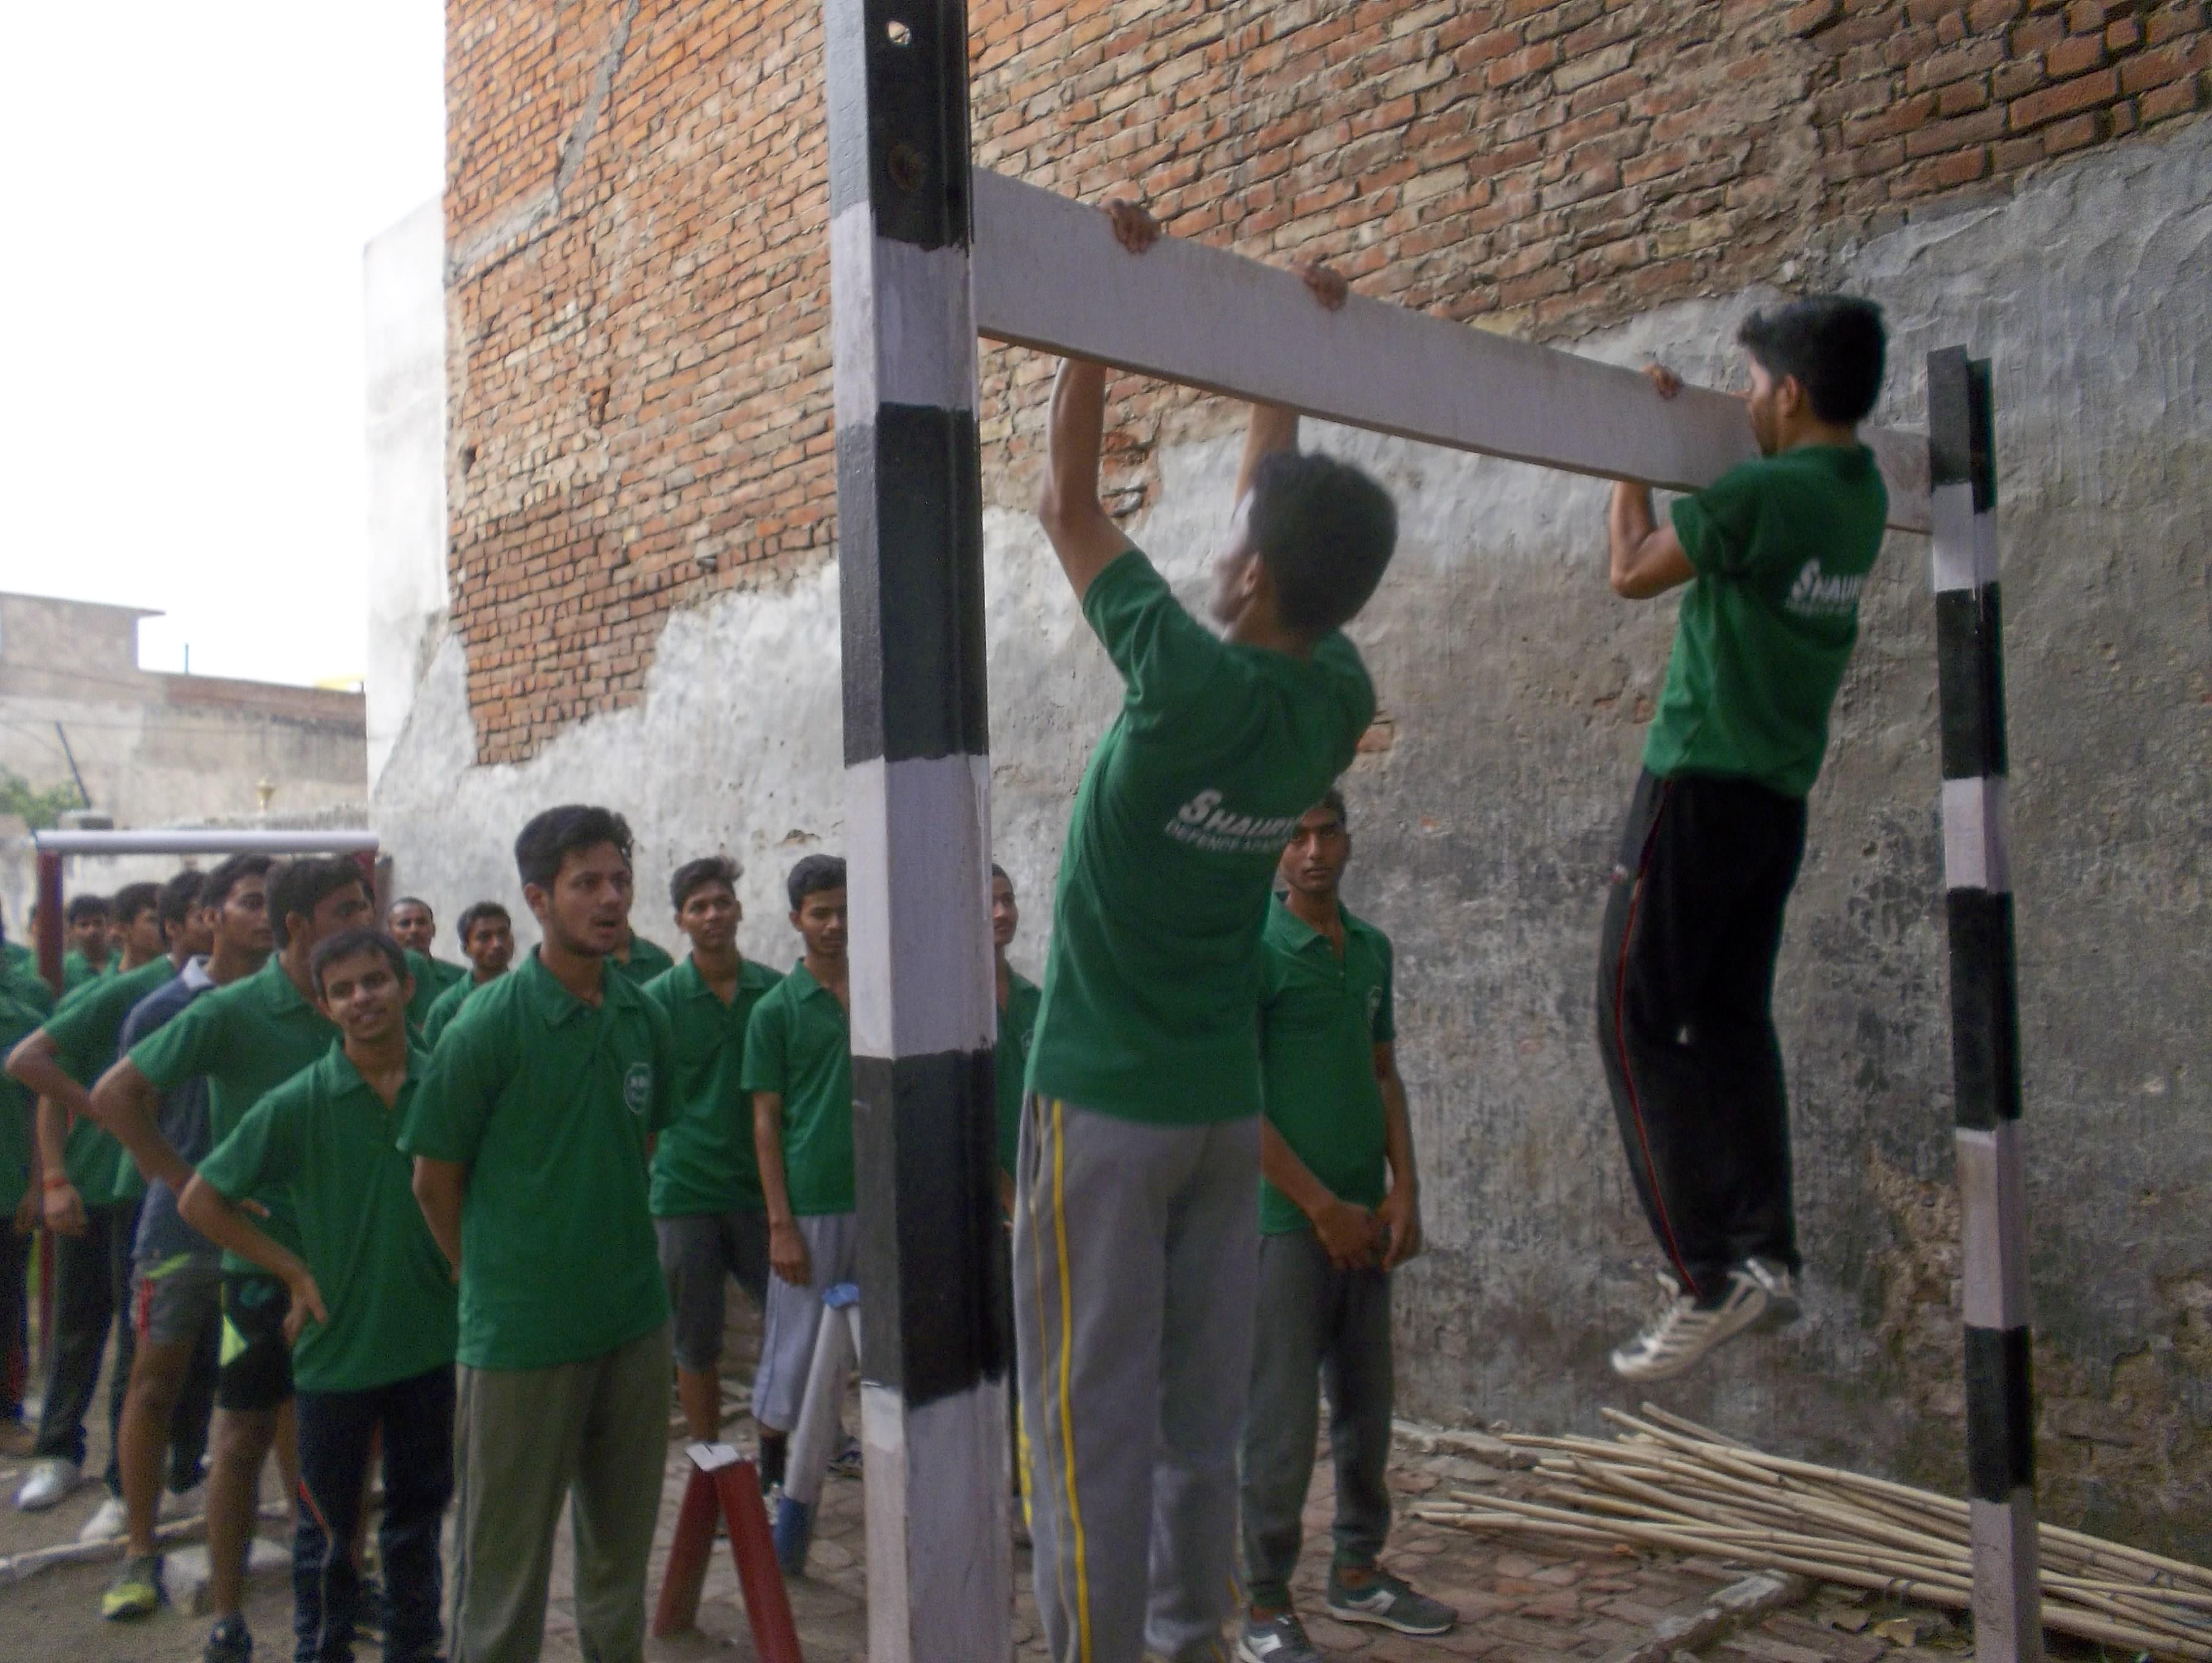 NDA Academy in Kanpur/NDA top coaching in Kanpur/top NDA coaching in Kanpur/ best coaching for NDA in -@kanpur; -@Lucknow; -Varanasi; -@Allahabad; -@Gorakhpur ;-@Uttar Pradesh, /by-Shaurya Defence Academy 91-7233920261/kanp